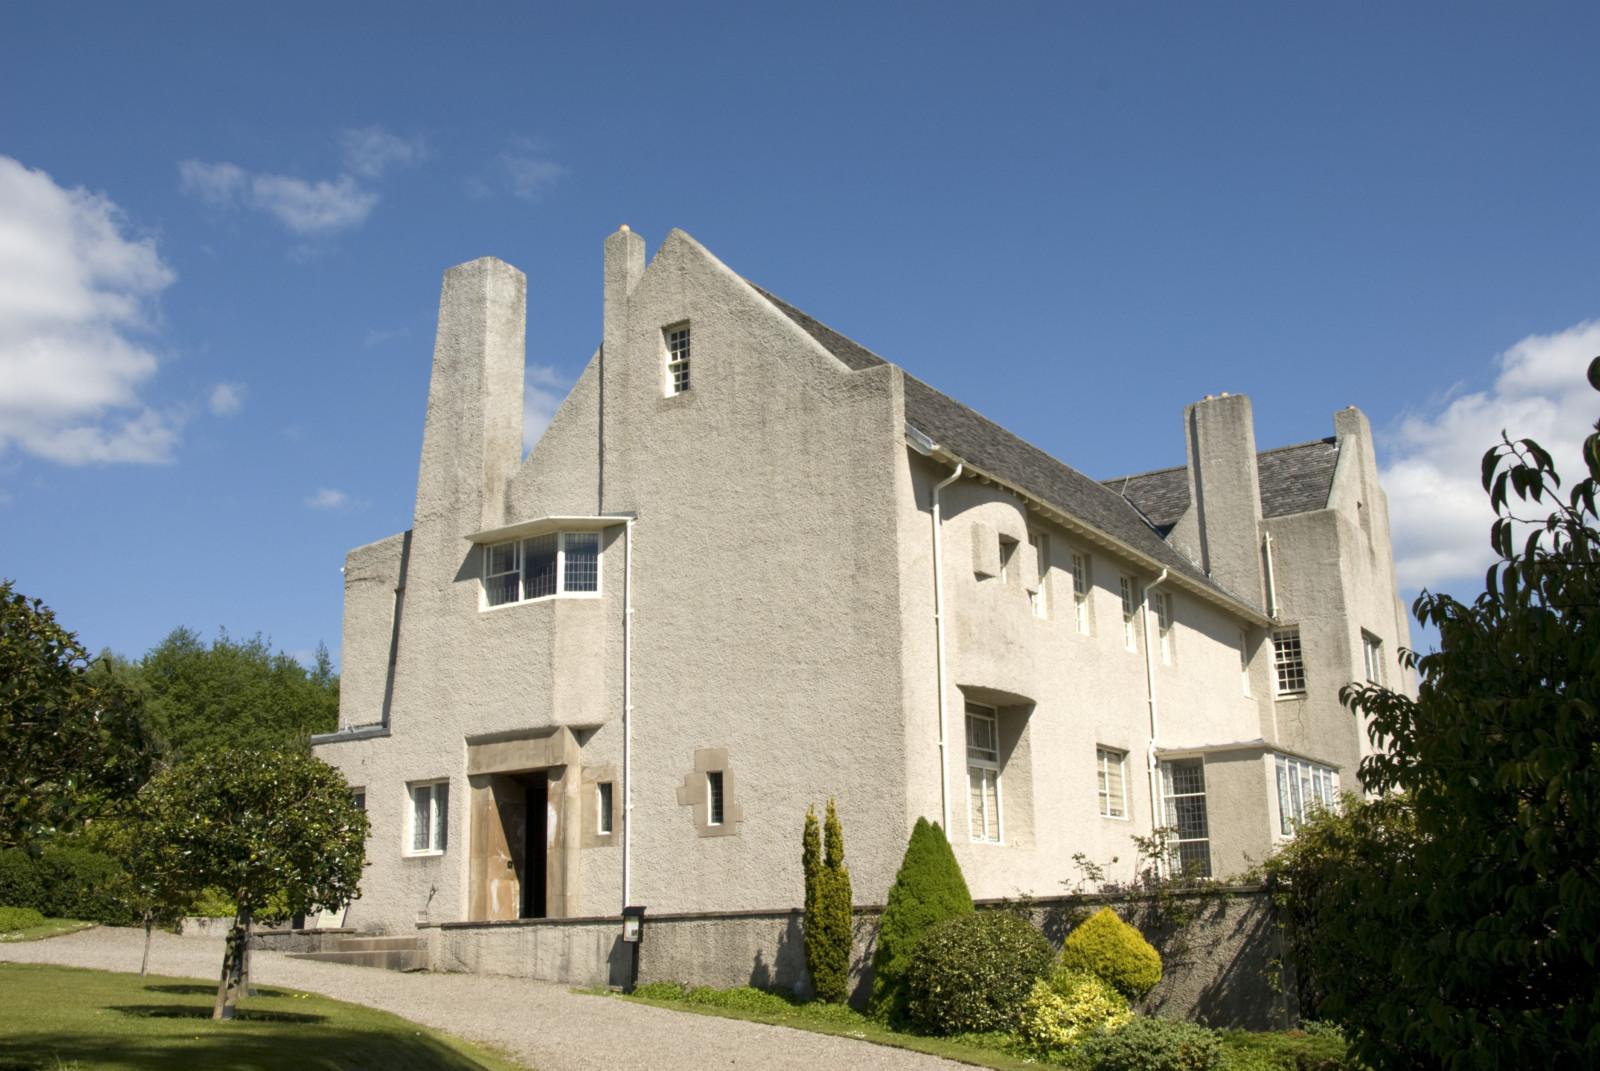 The Hill House, NTS, Argyll, Bute & Loch Lomond